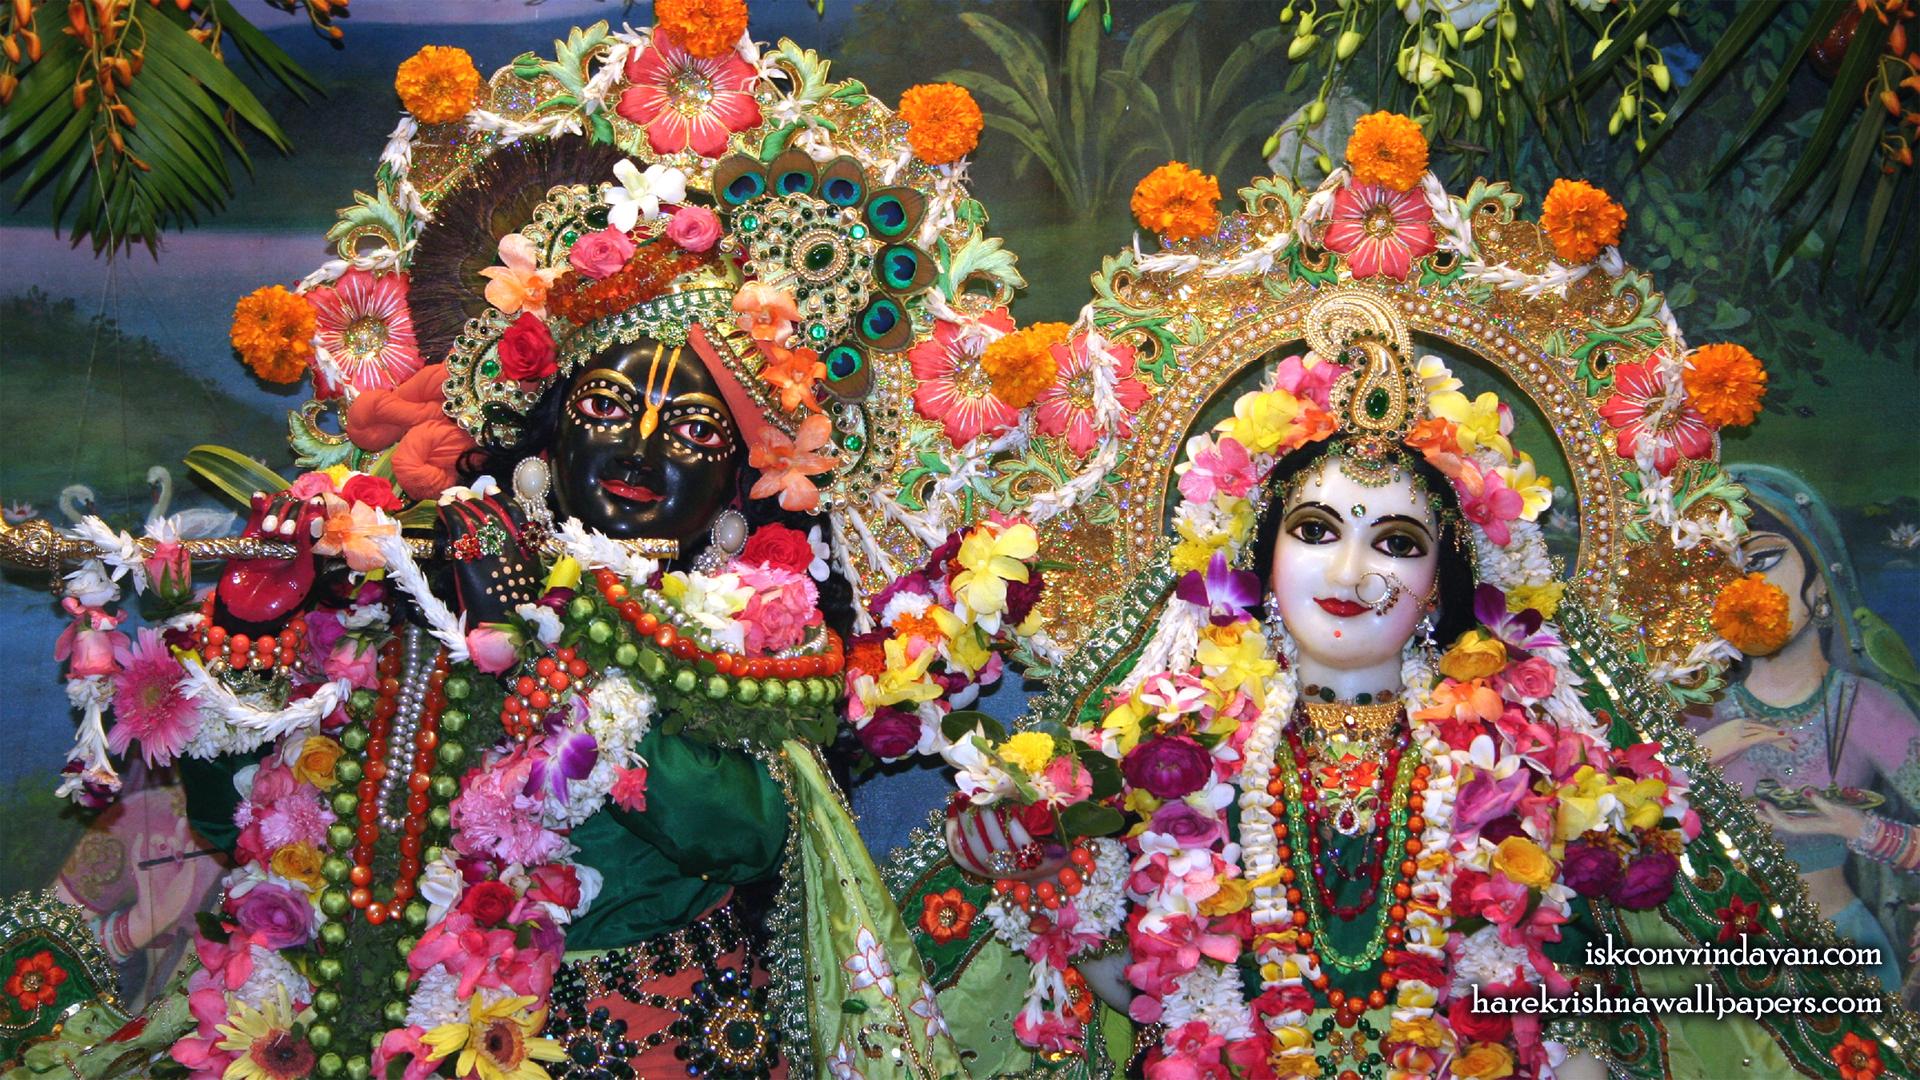 Sri Sri Radha Shyamsundar Close up Wallpaper (002) Size 1920x1080 Download